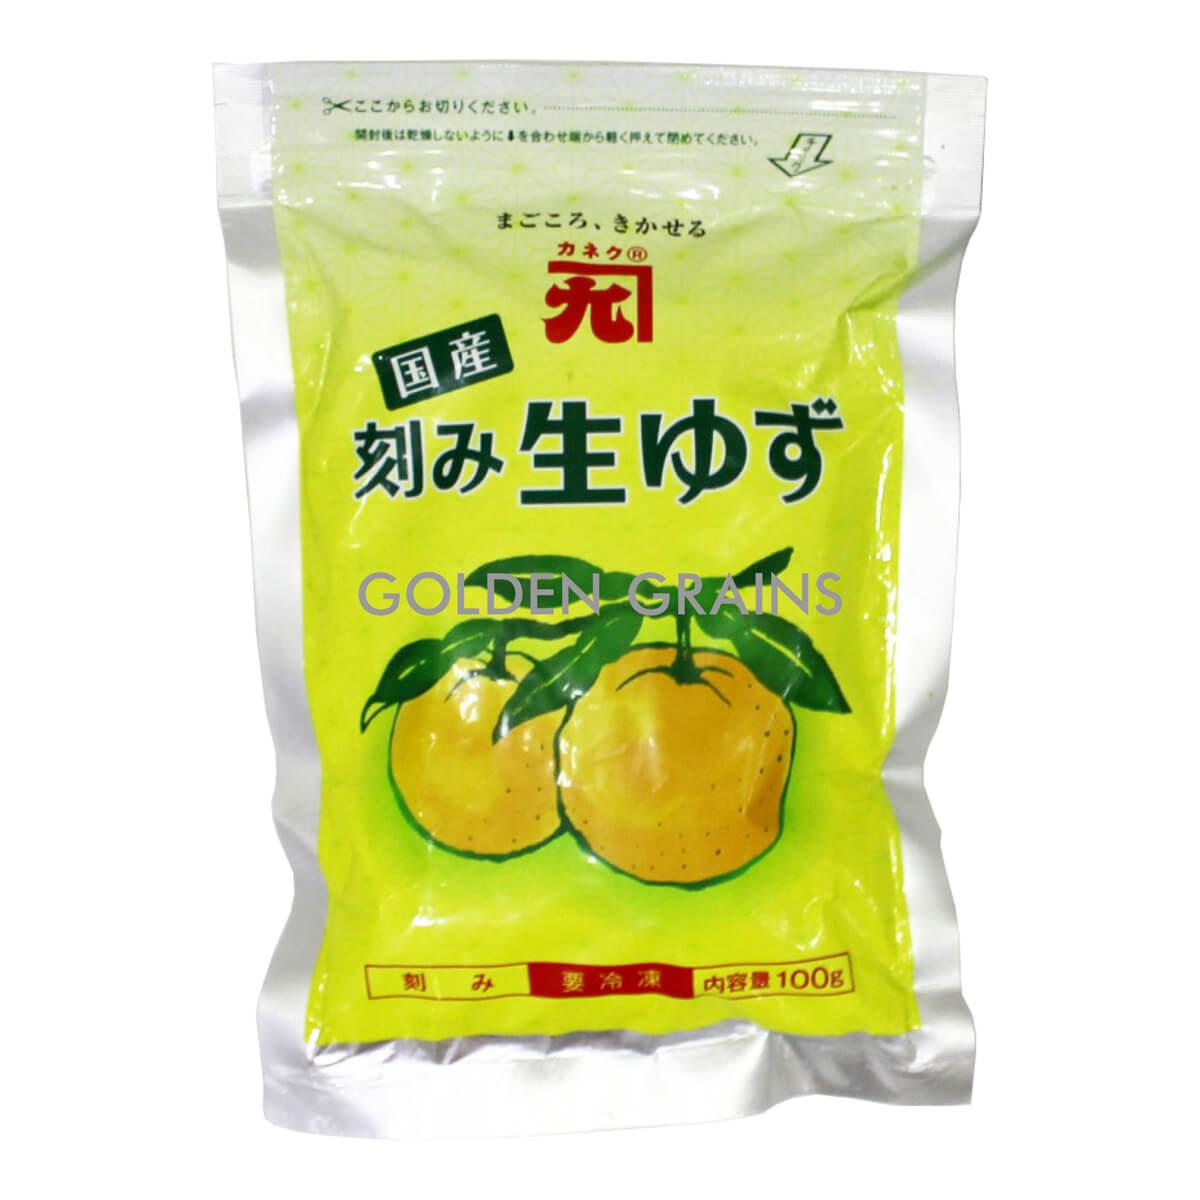 Golden Grains Kaneku - Yuzu Peel - Front.jpg